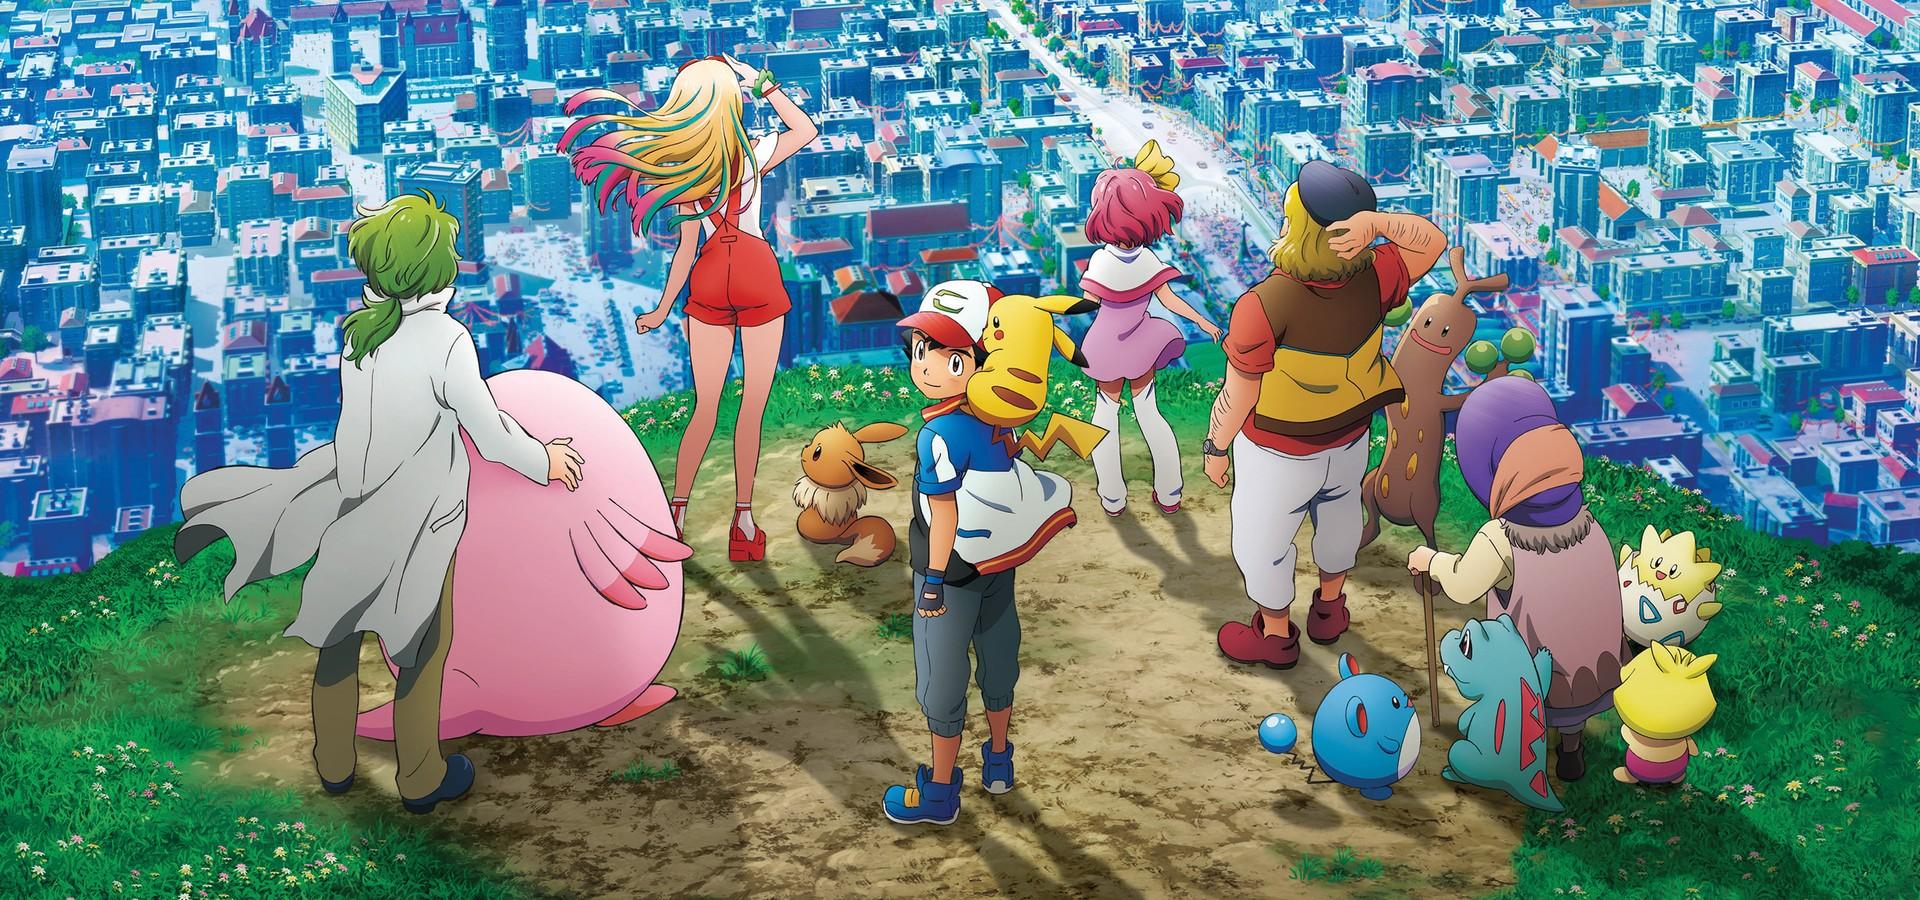 Pokemon the movie: The power of us